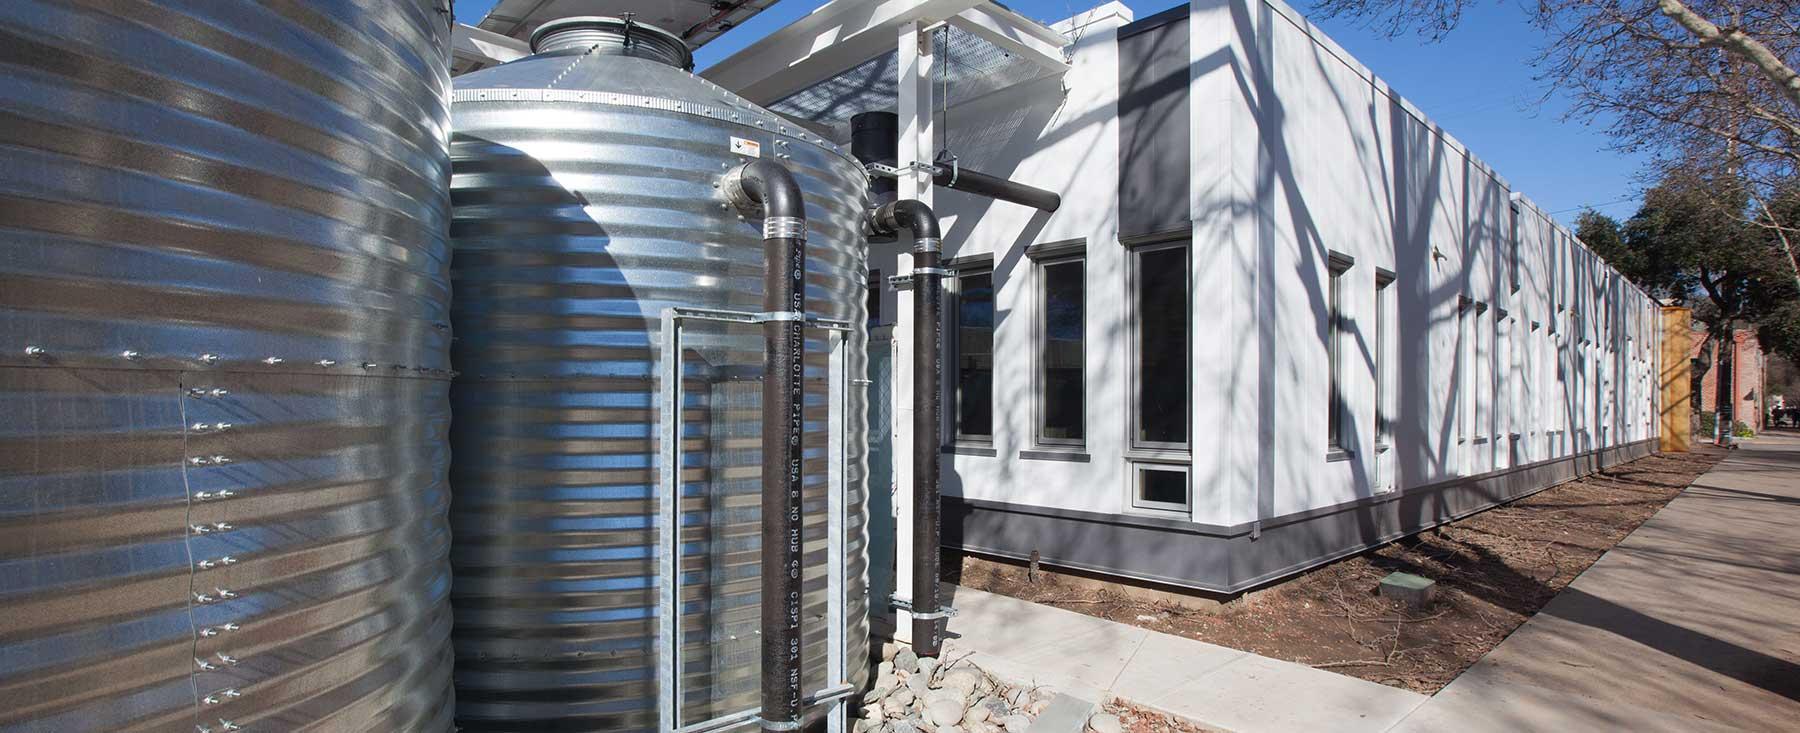 Rainwater Cistern at Arch | Nexus SAC